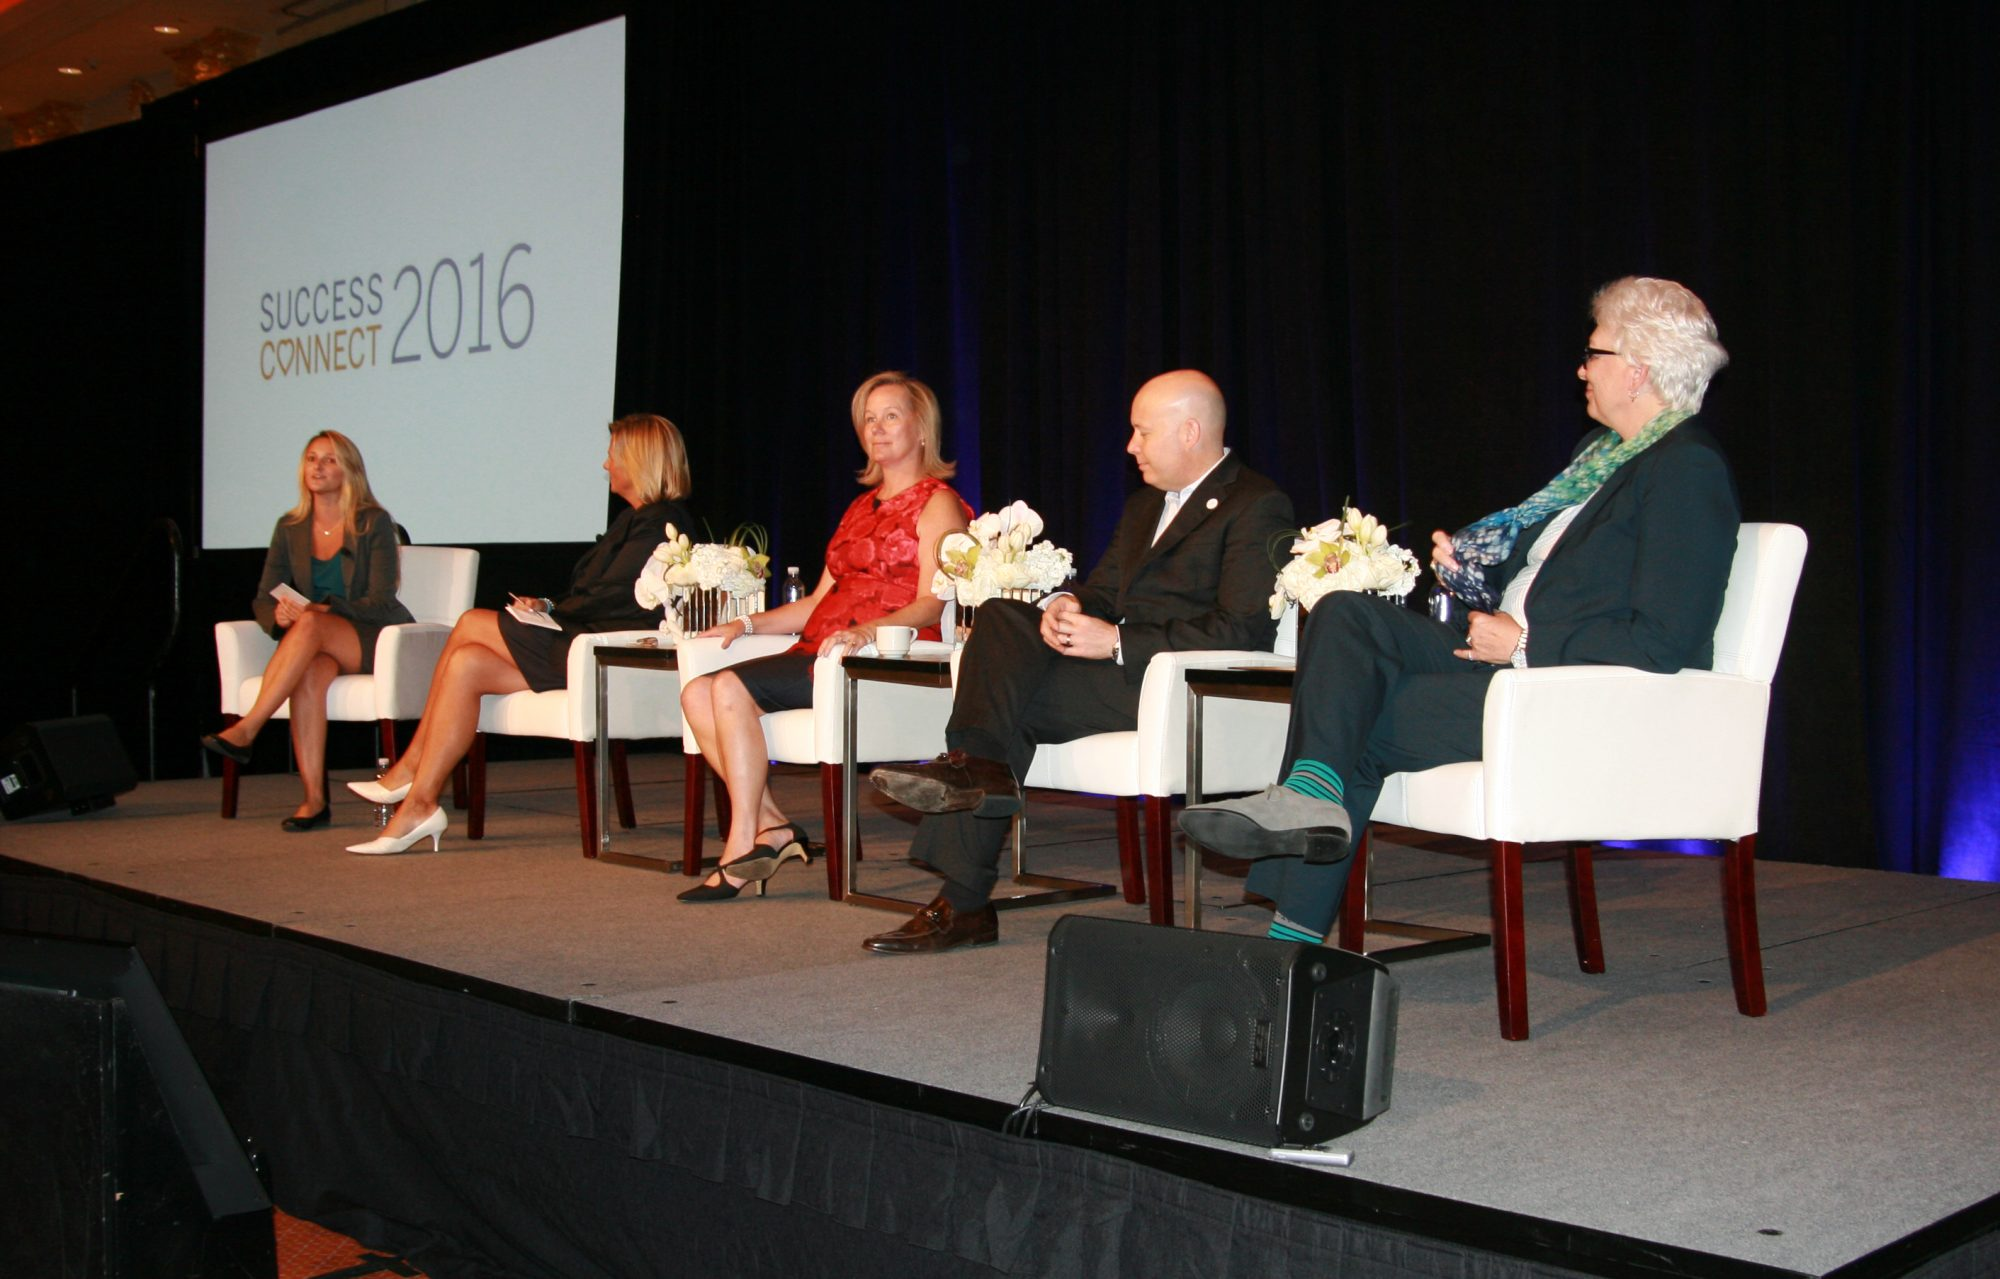 SAP Slideshow 13b - Women in Leadership